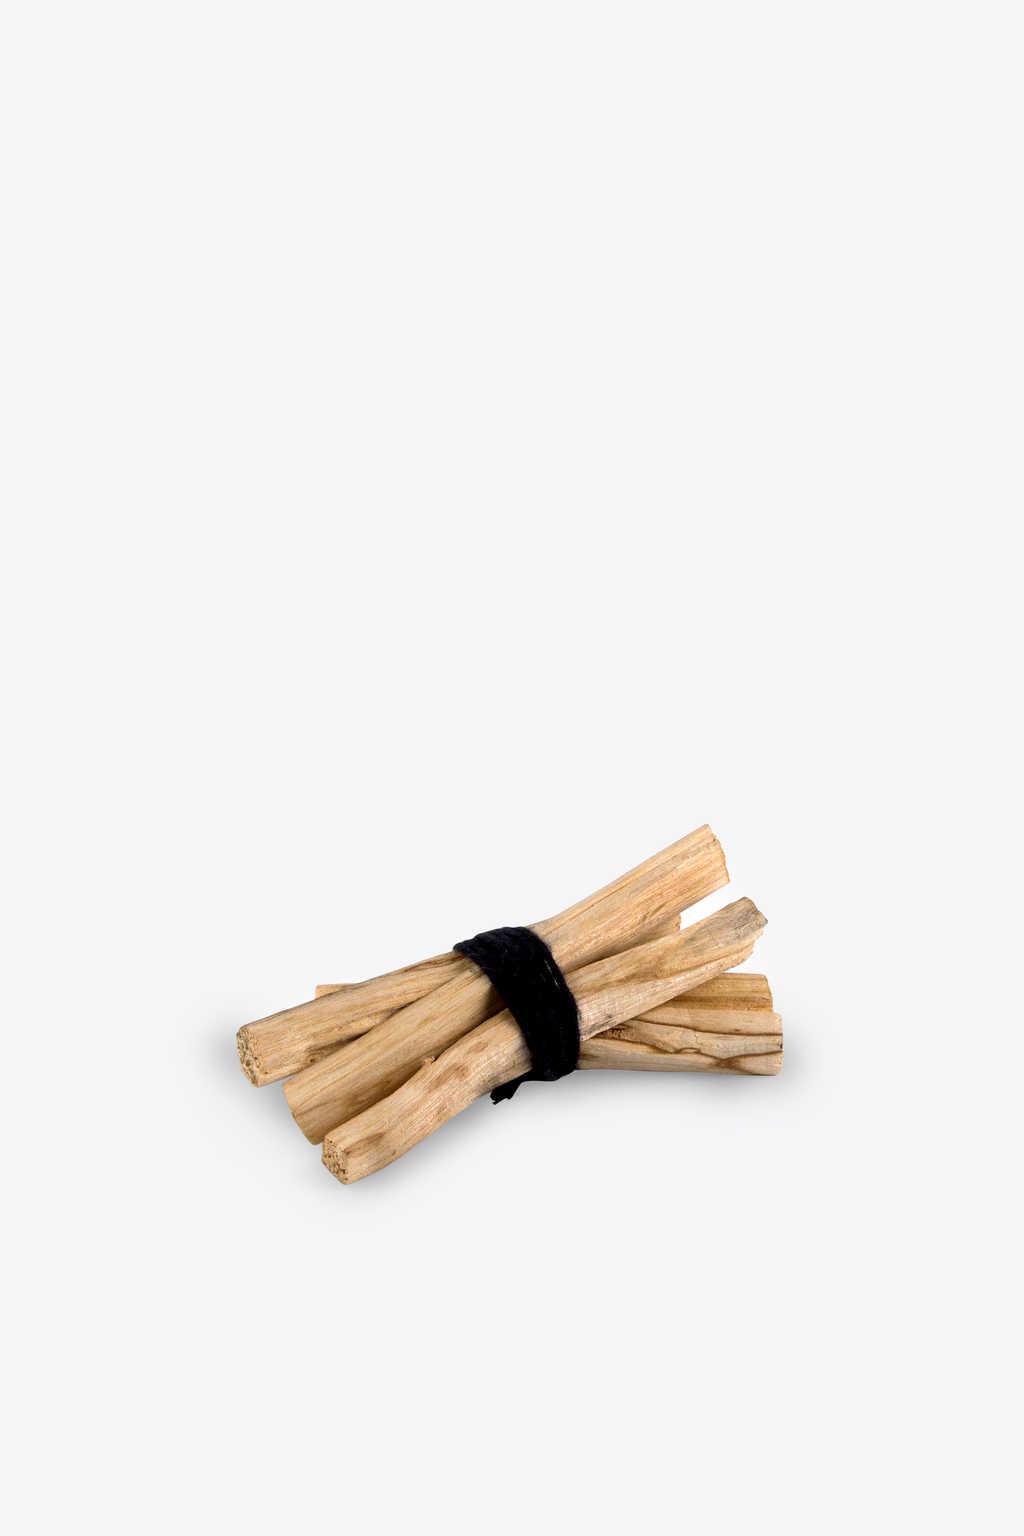 Woodlot Palo Santo Incense Brown 2